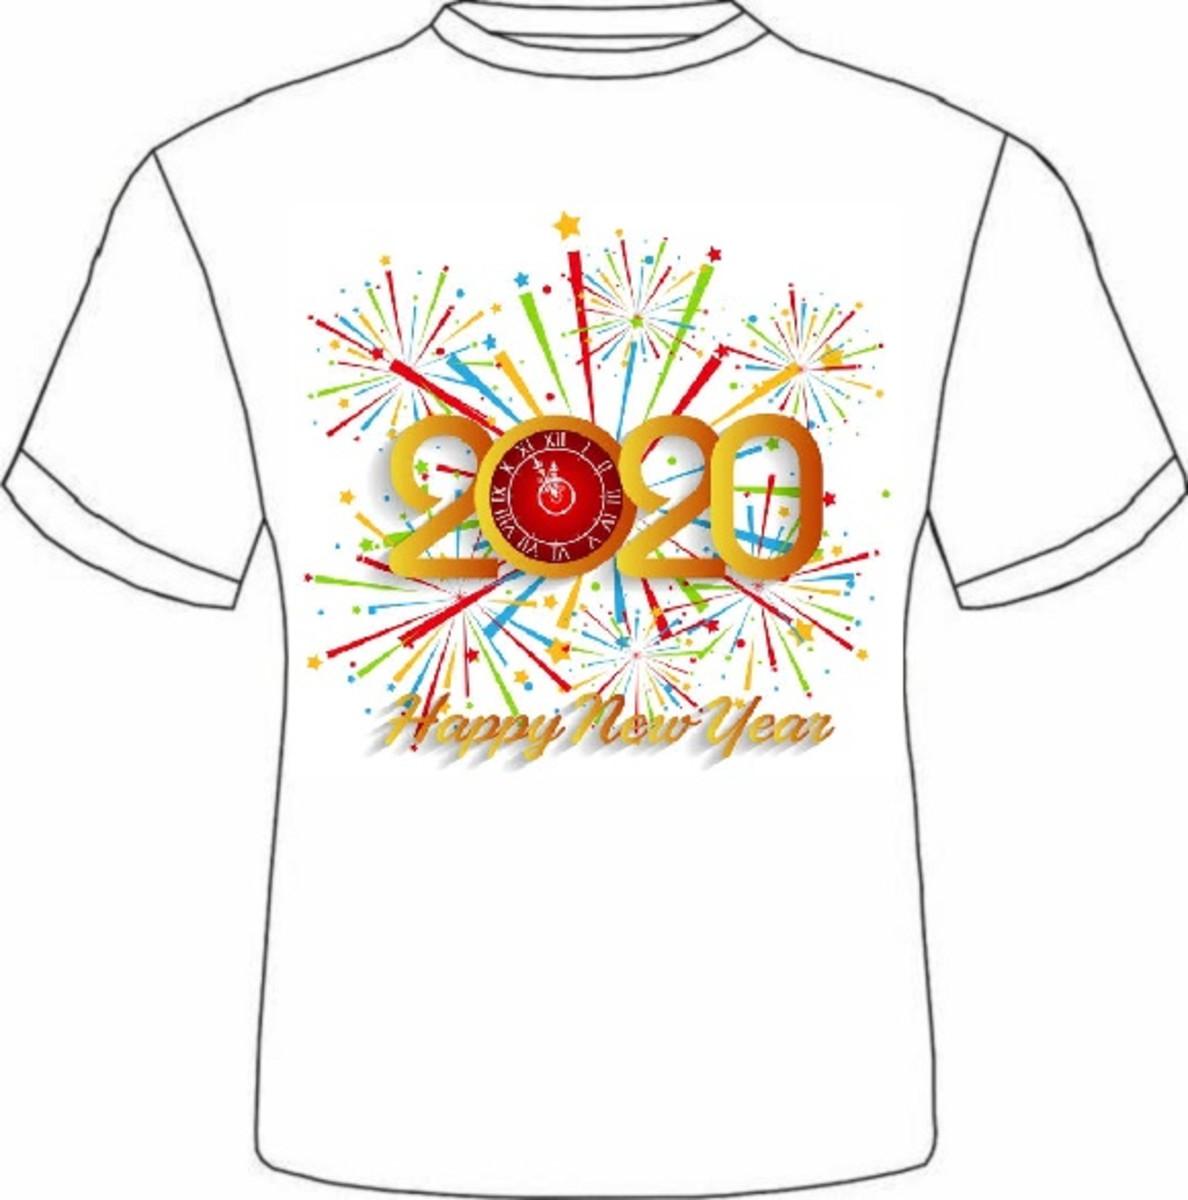 Linda Camiseta Camisa Feliz Ano Novo Reveillon 2020 Virada